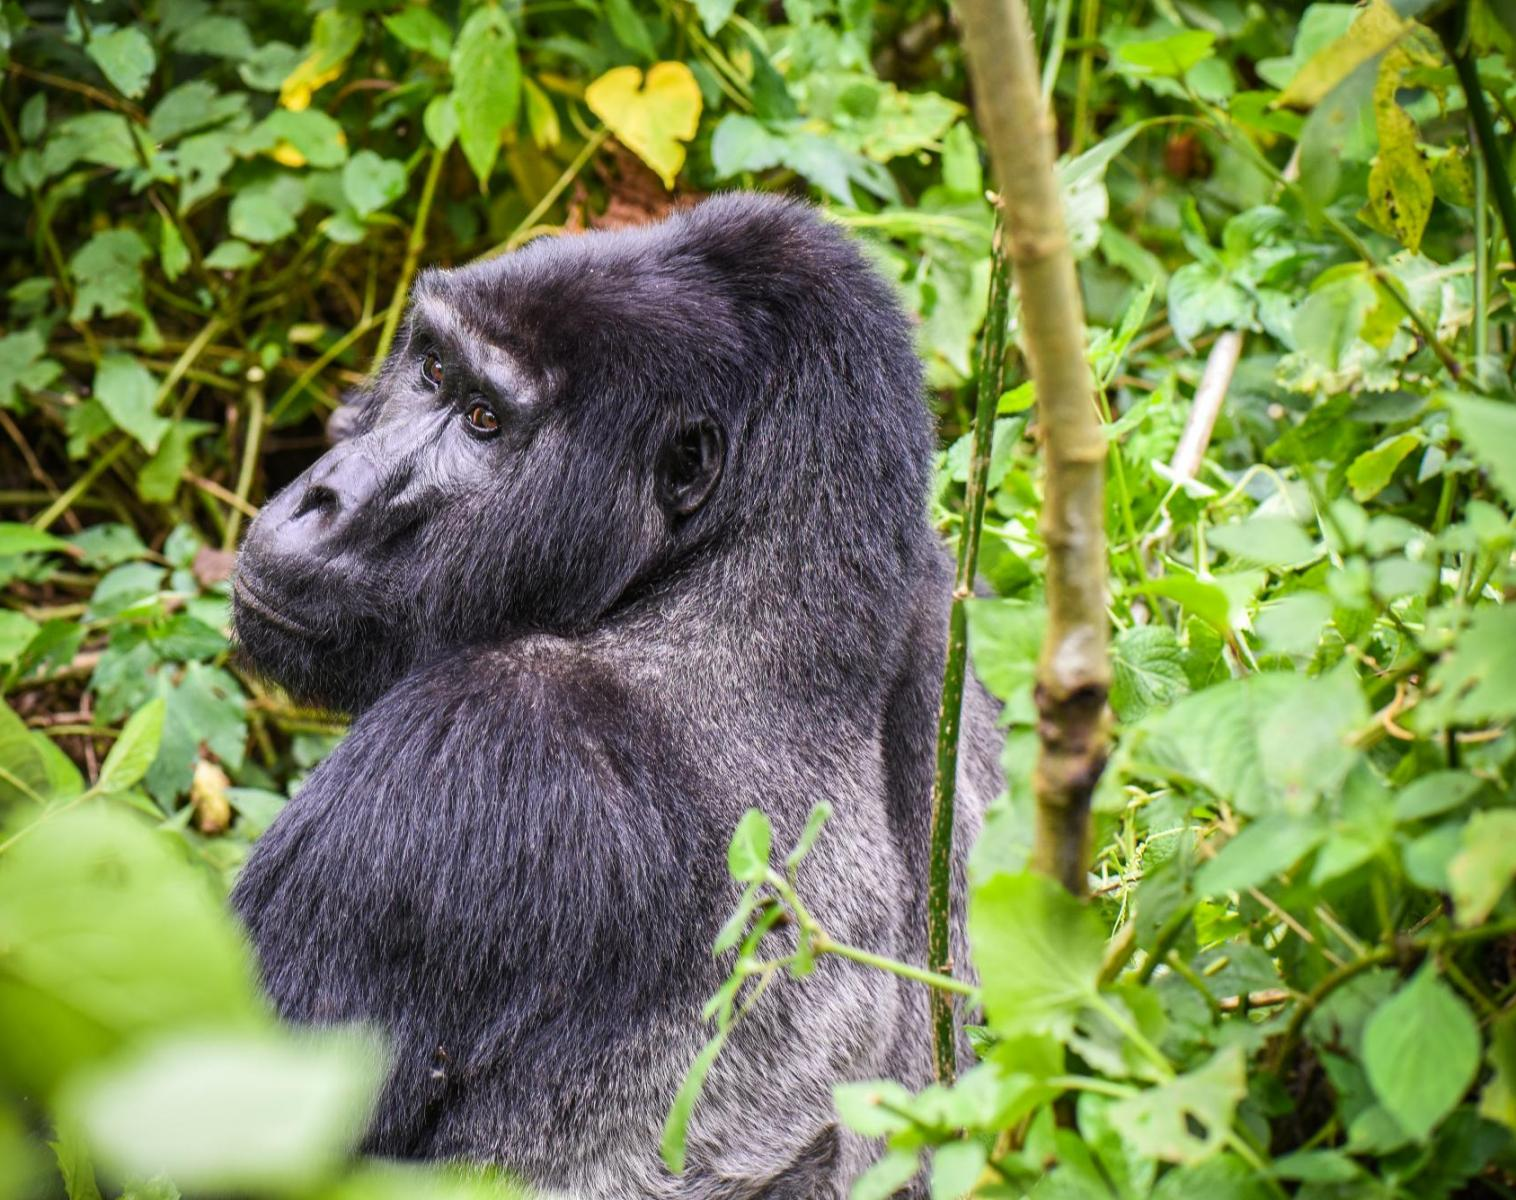 Ouganda  Focus gorilles et chimpanzés, spécial photo   Photo Observation nature Safari Navigation Balade nature